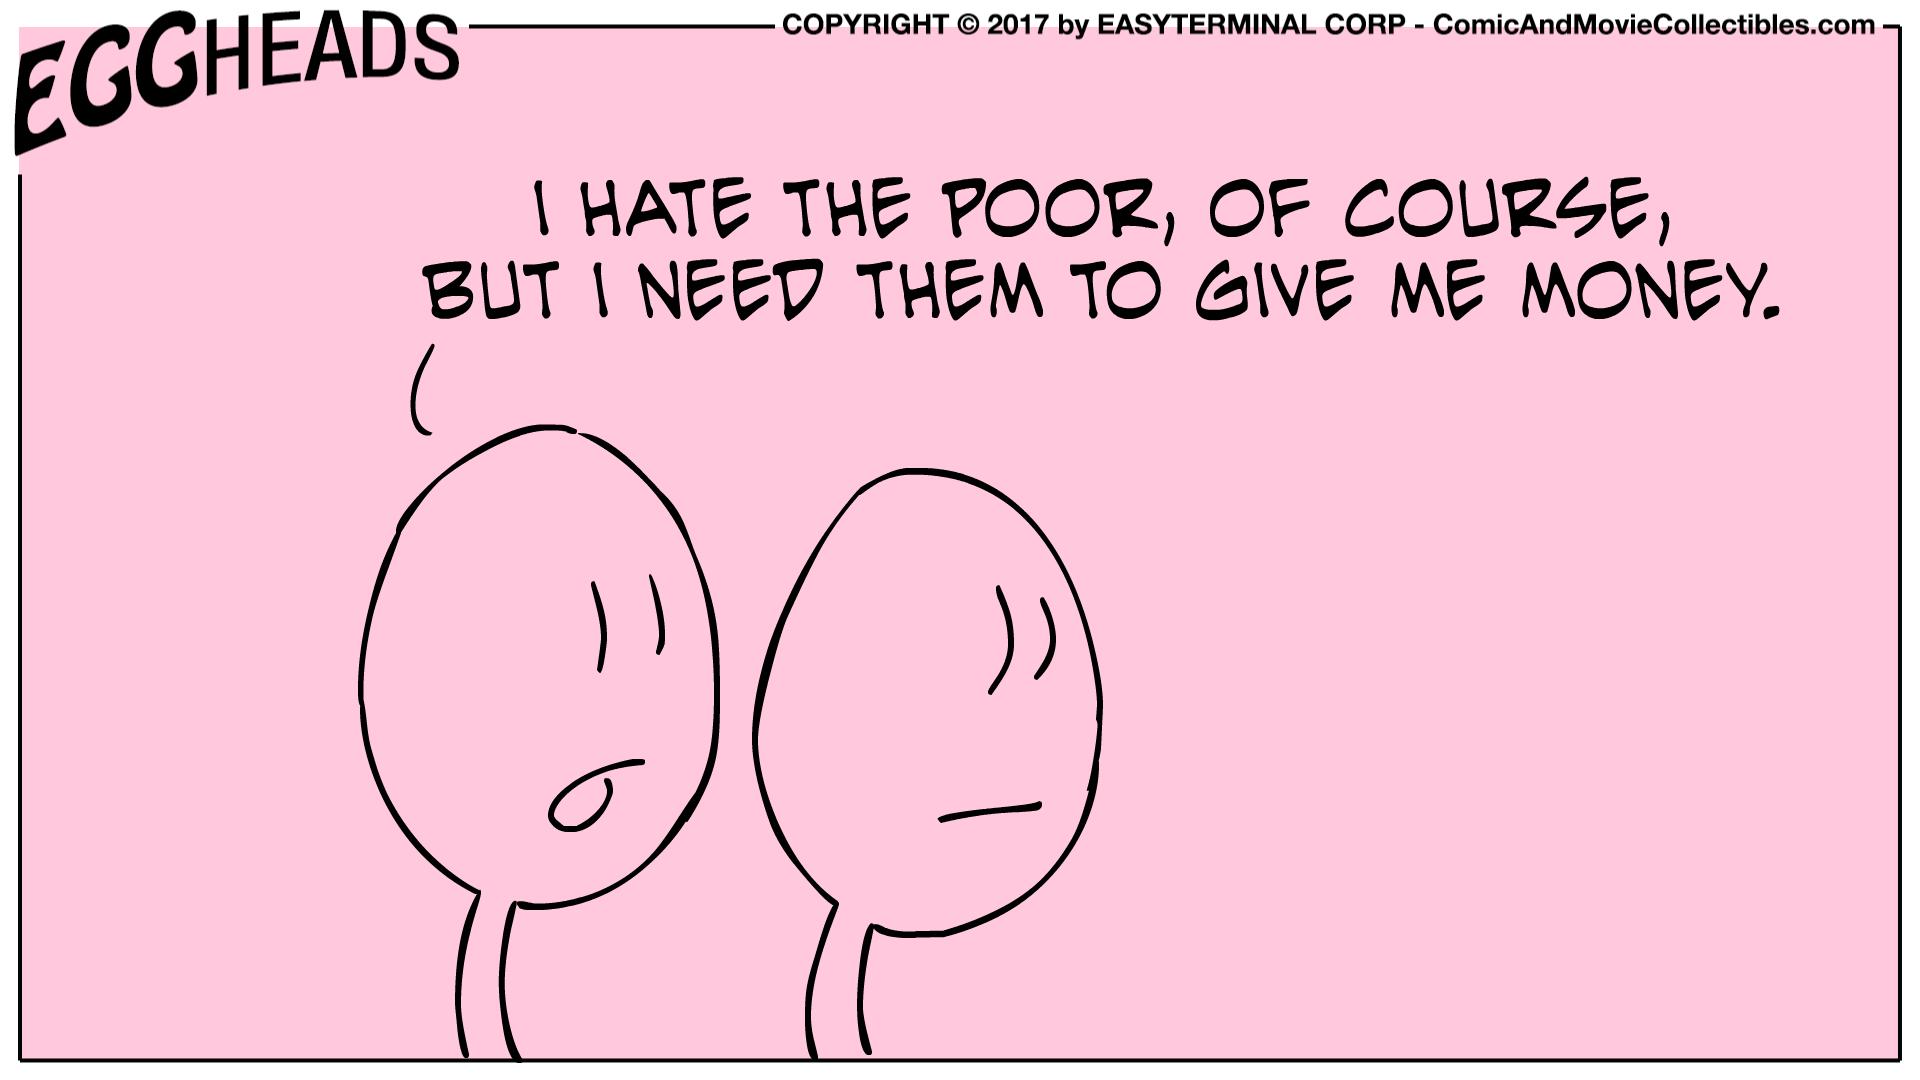 Webcomic Eggheads Comic Strip 003 The Poor